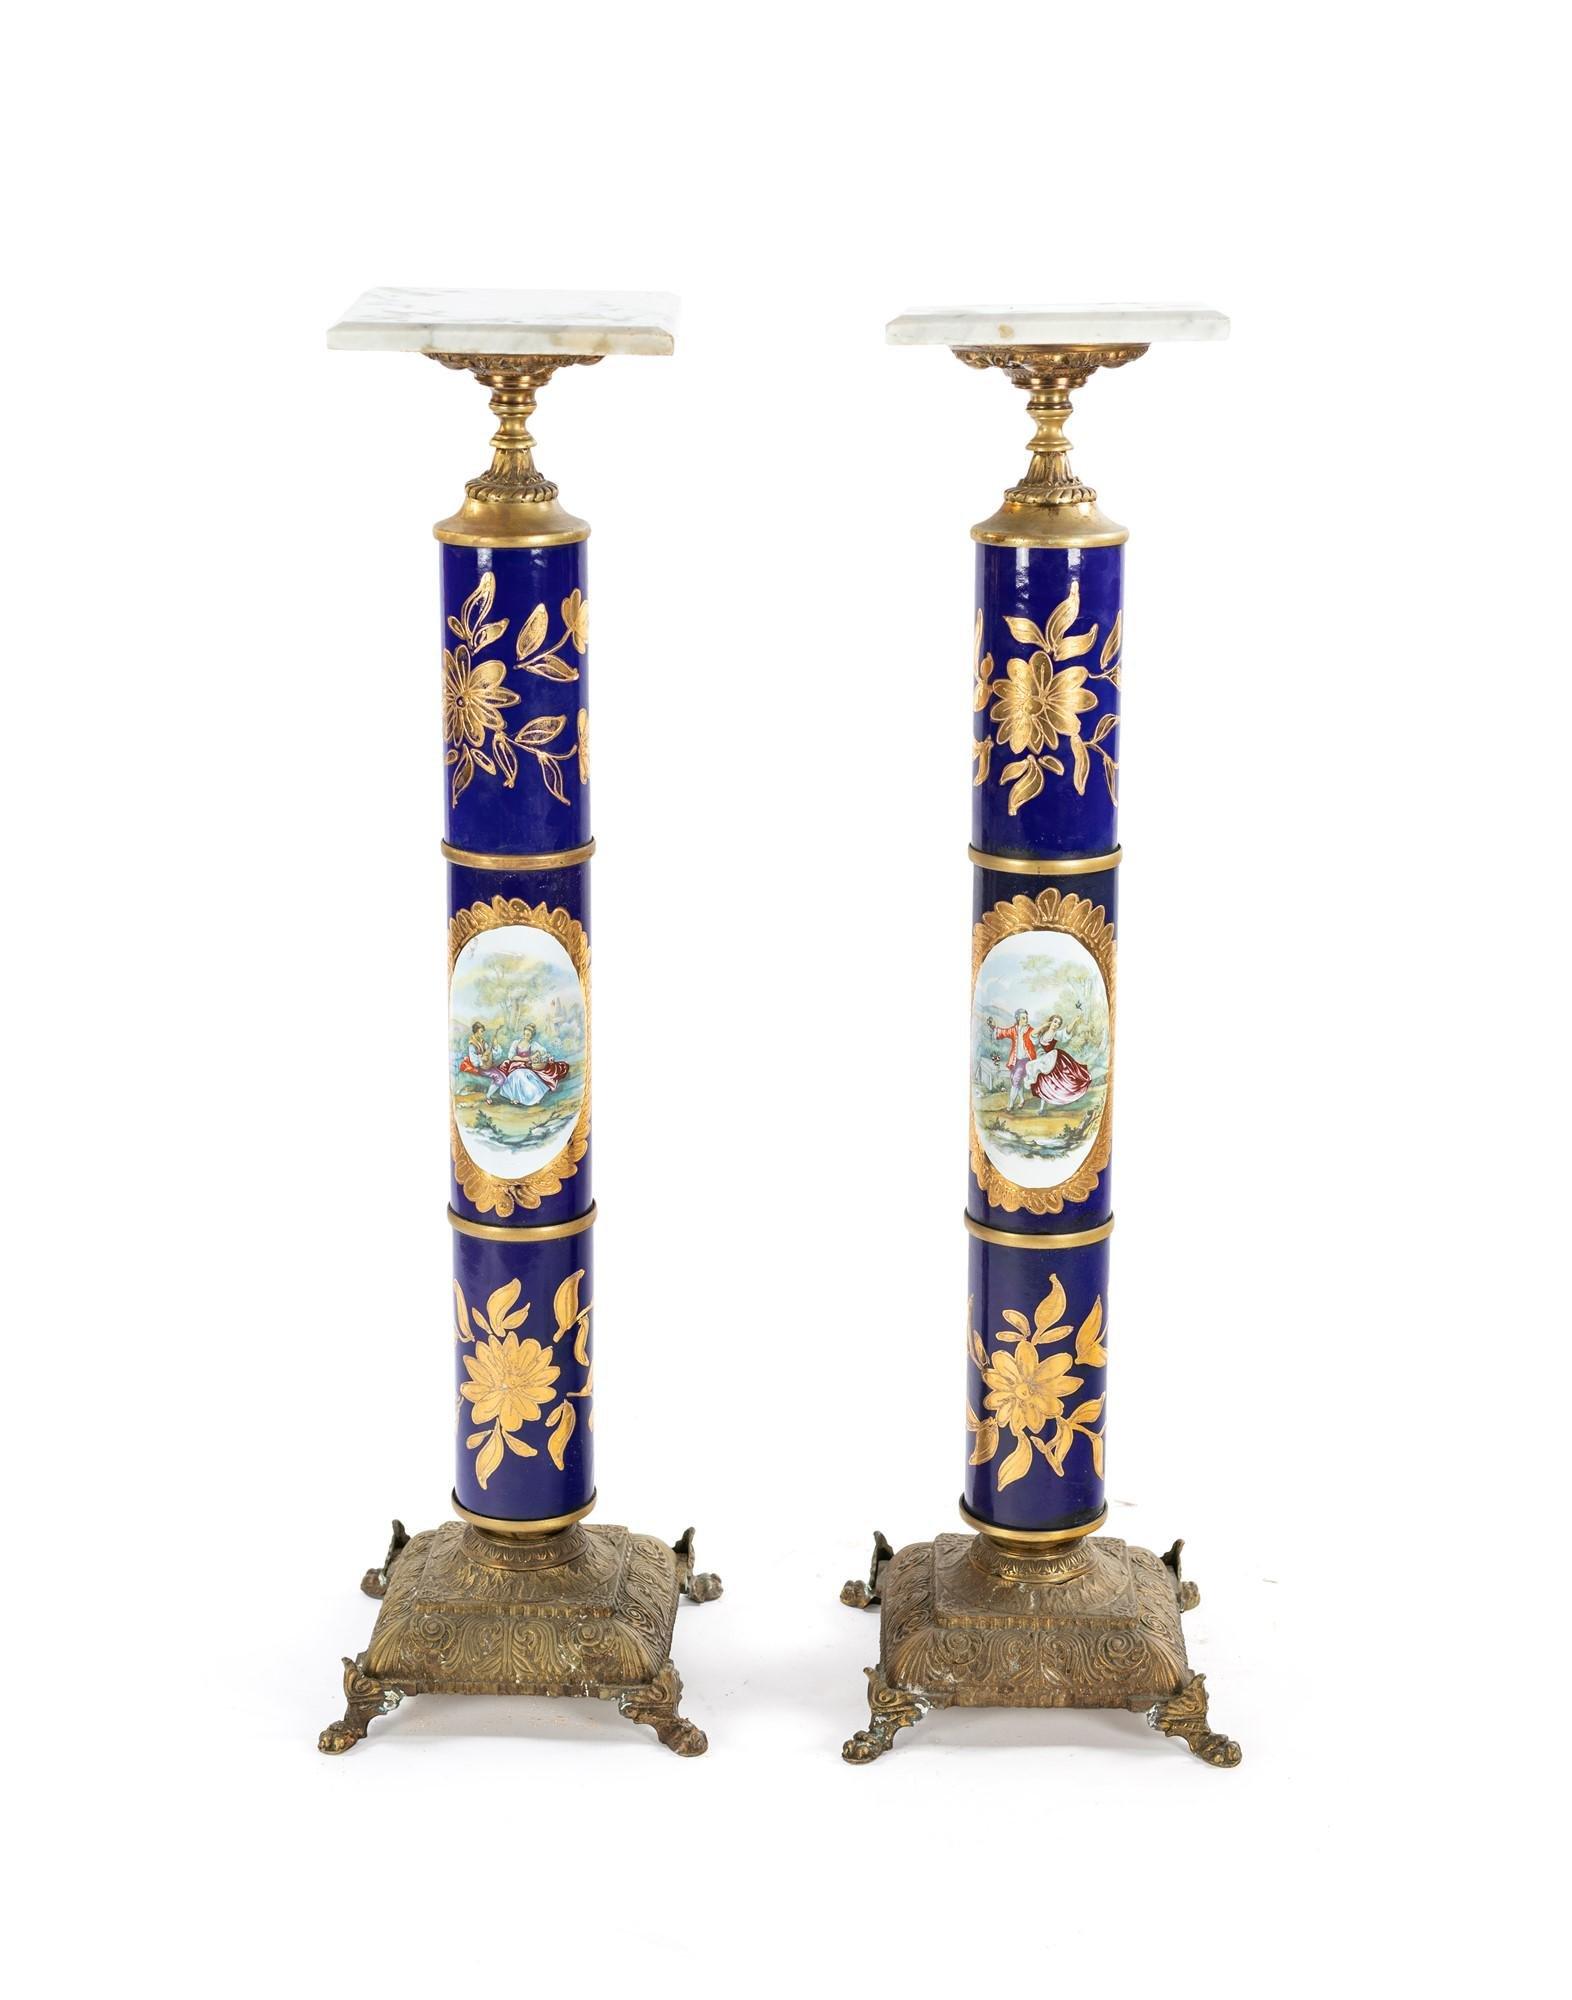 Pair of blue and golden porcelain columns